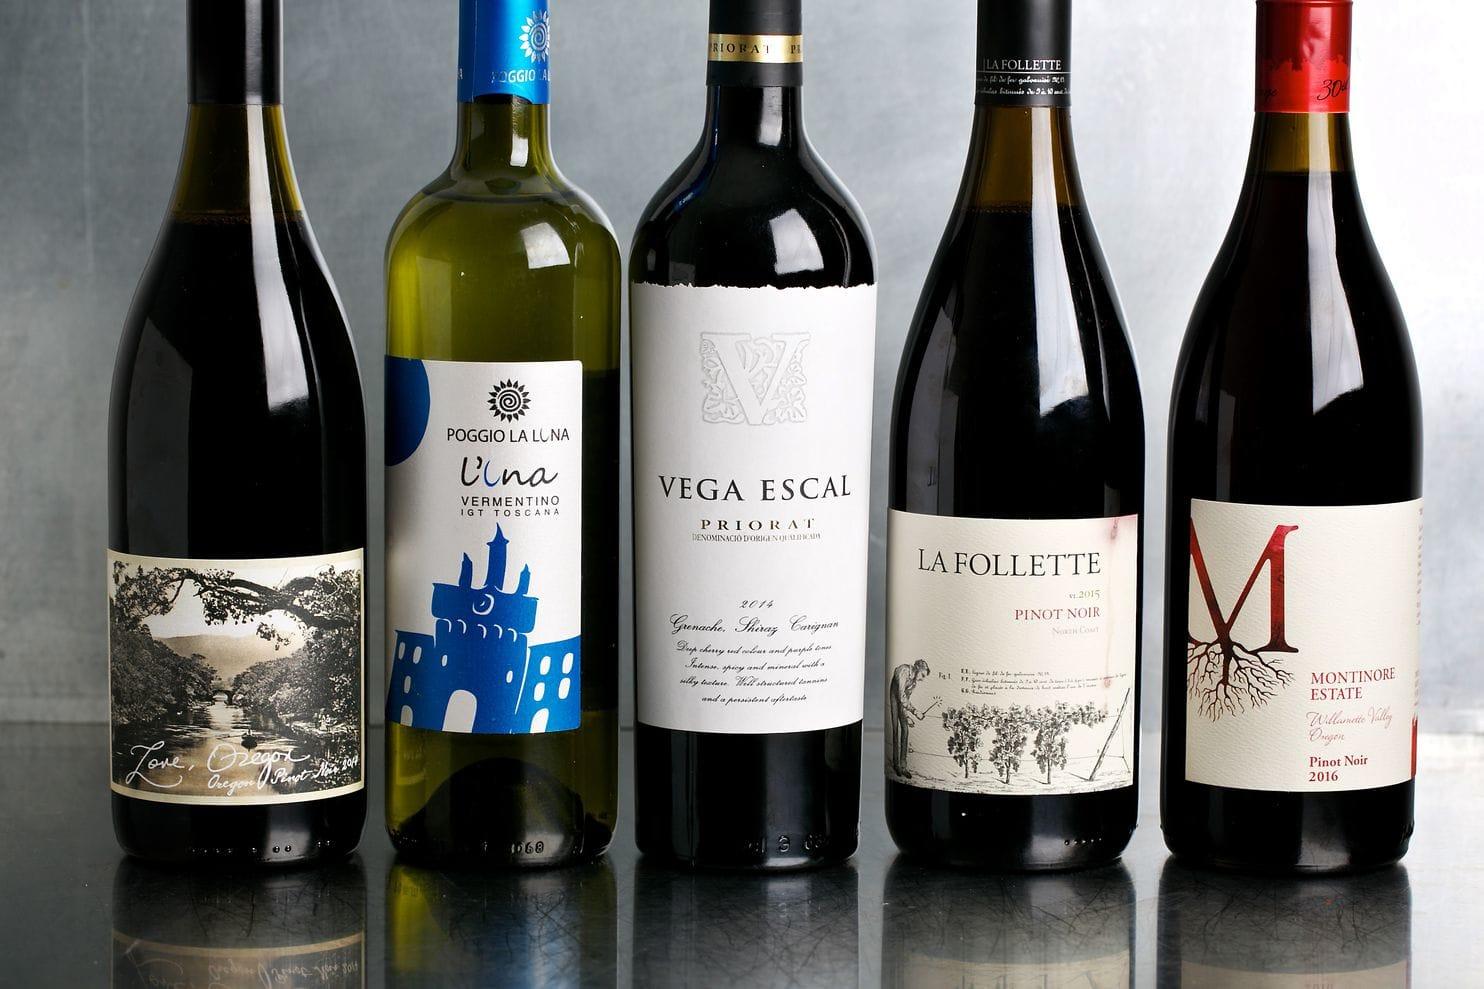 Five $20 Wines Good Enough For A Millionaire Like Steven Mnuchin photo